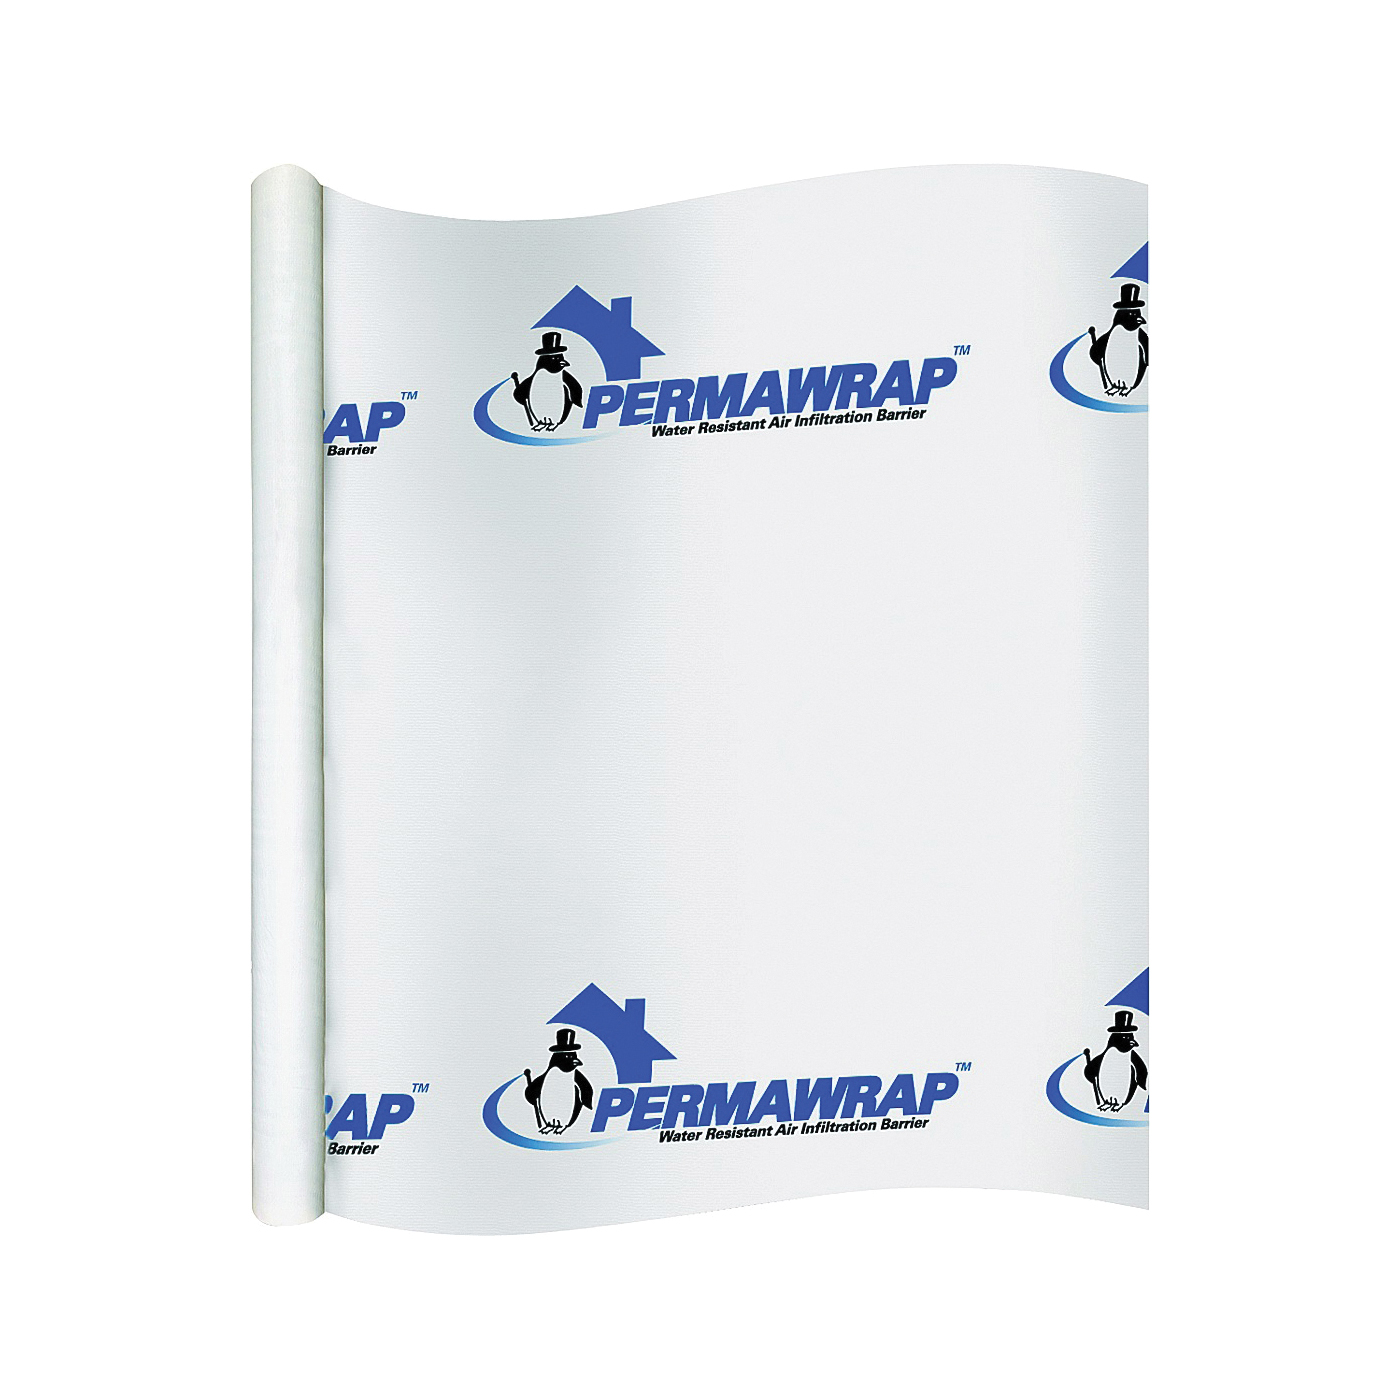 Picture of PermaPro 09150 House Wrap, 150 ft L, 9 ft W, Polypropylene, Translucent